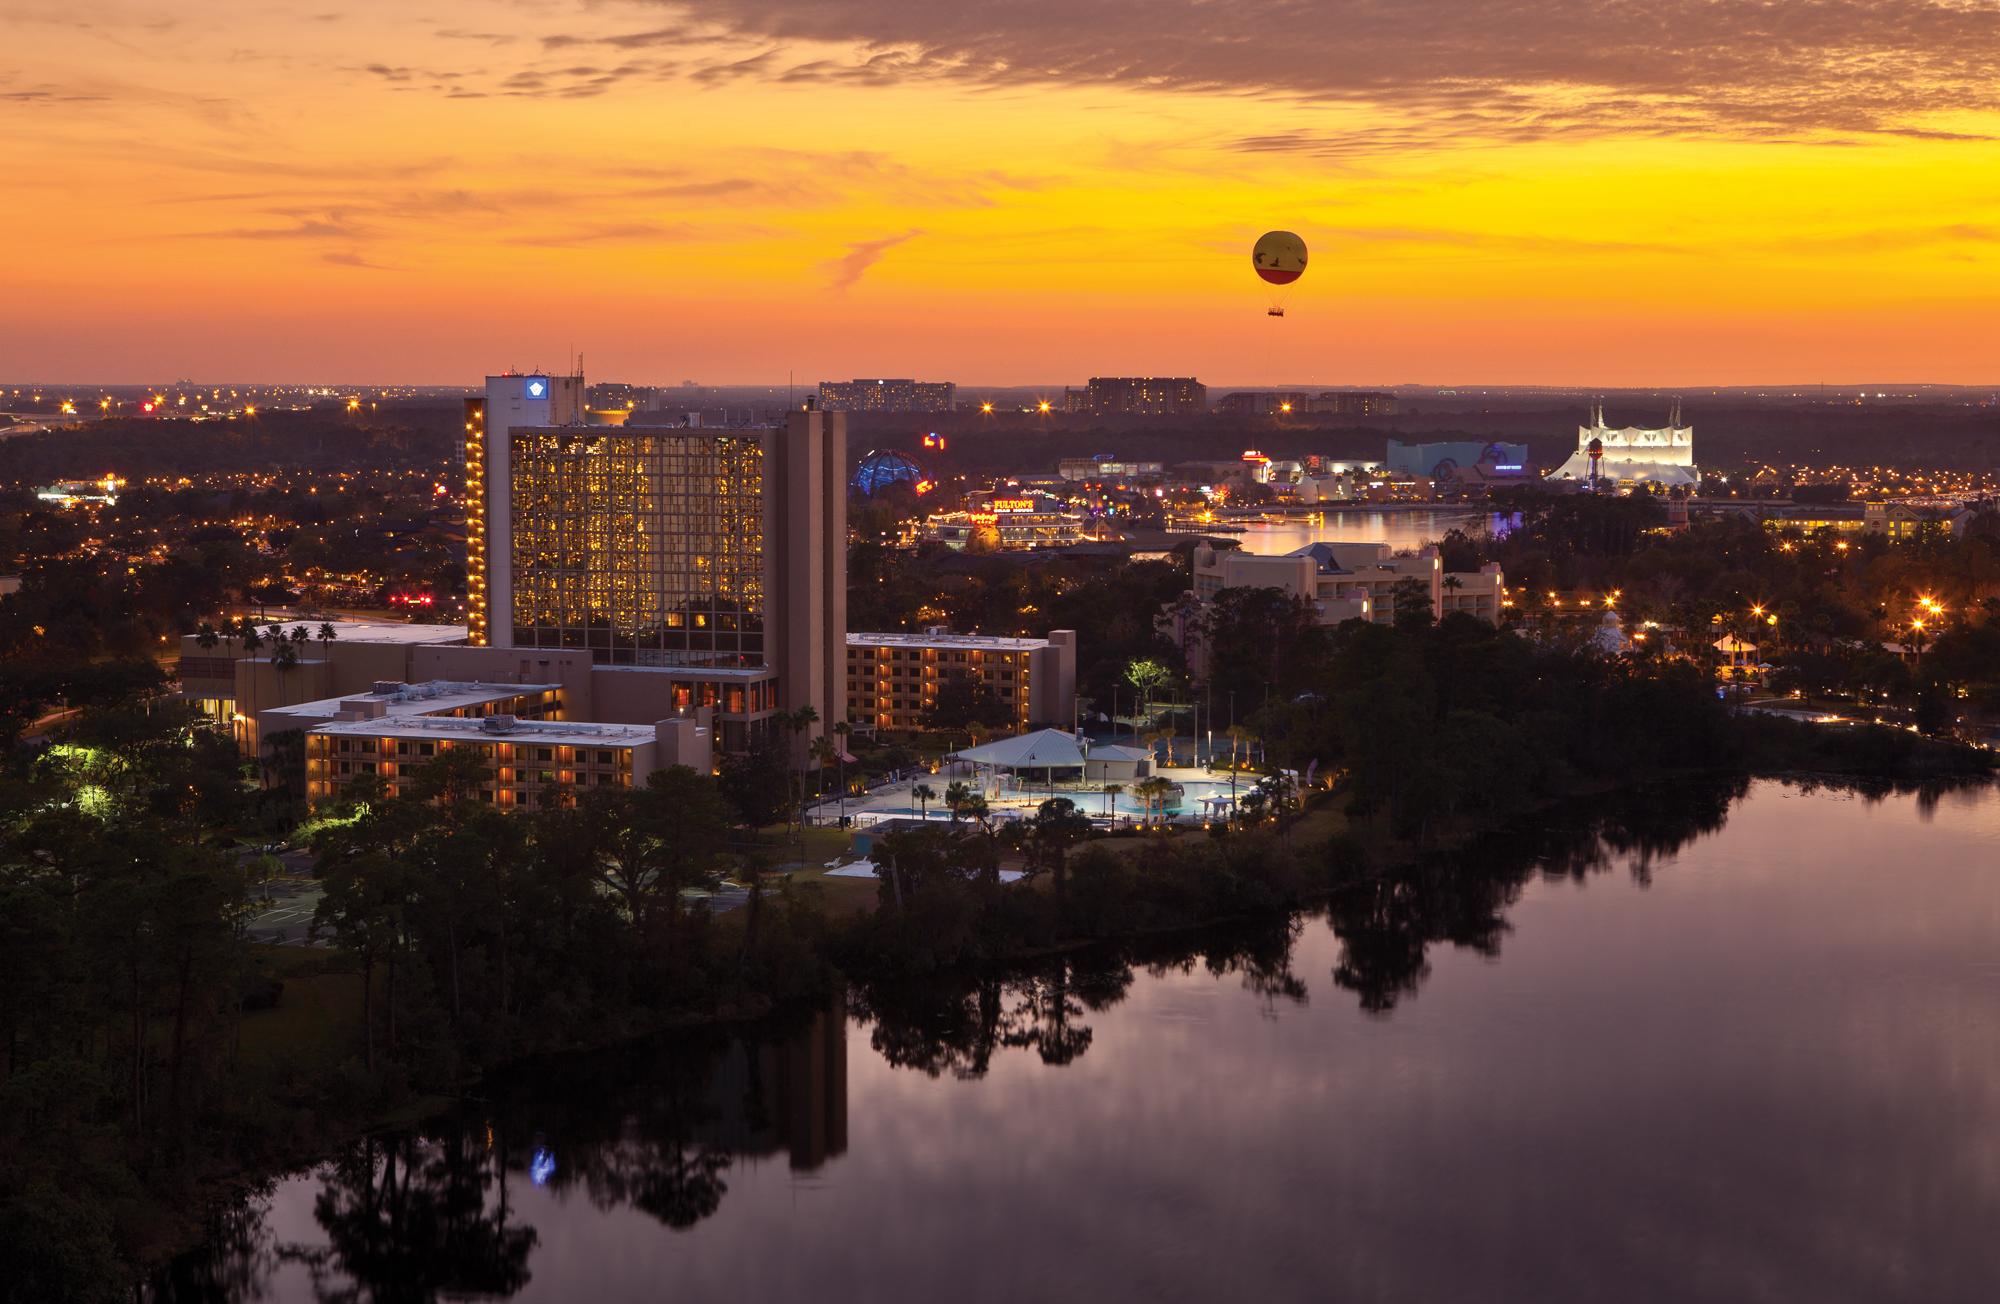 Disney Springs Resort Area Hotels Offering Special Holiday Rates Through December 22 Disney